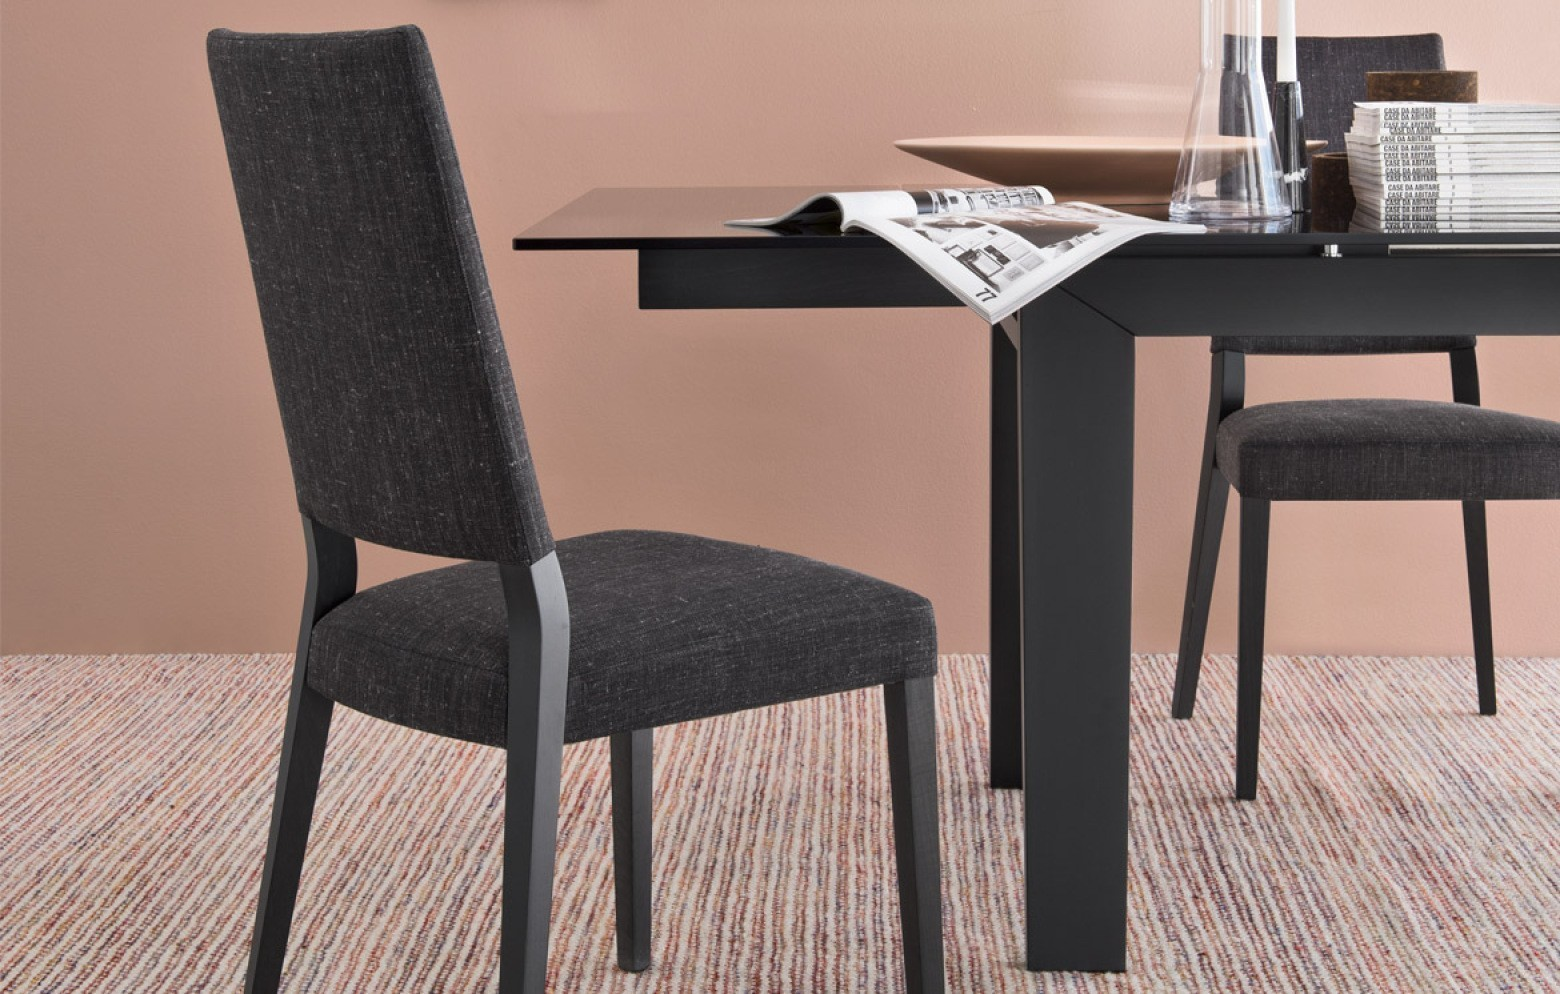 sandy sonderedition st hle tische st hle who 39 s perfect. Black Bedroom Furniture Sets. Home Design Ideas